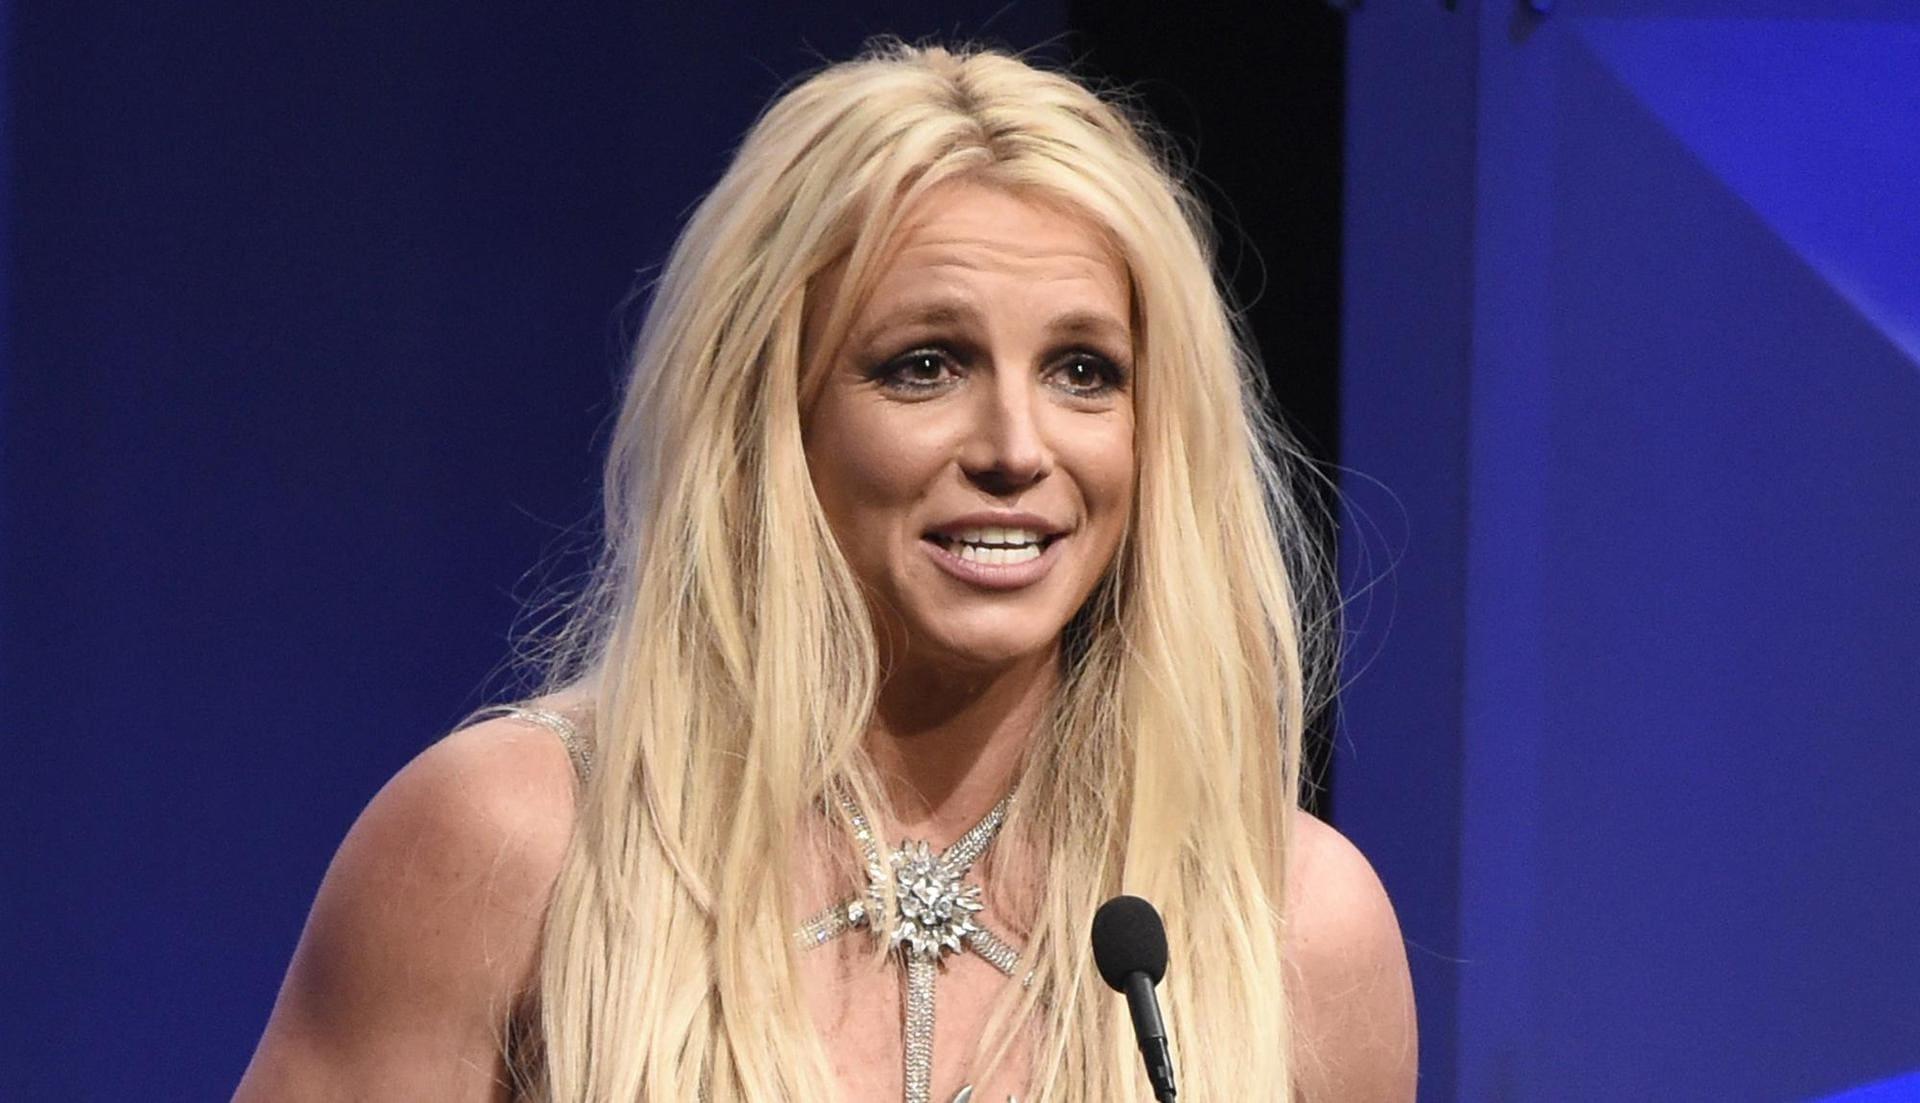 «New York Times»-Doku über Britney Spears' Vormundschaft Hinterfragt